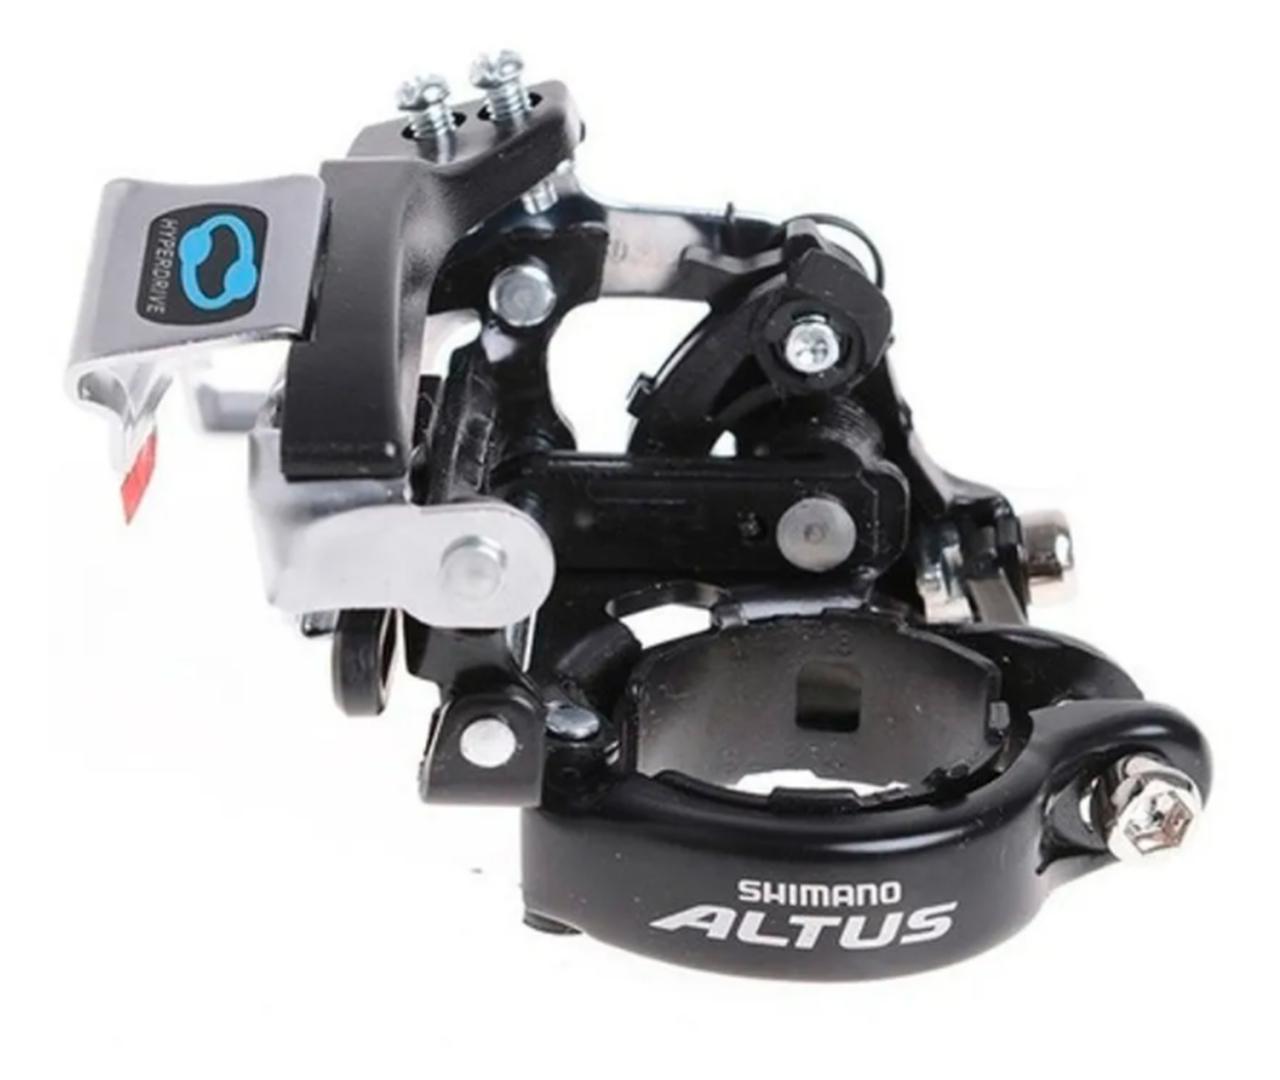 CAMBIO DIANTEIRO SHIMANO ALTUS FD-M310 TRIPLO 31.8MM 8V T SWING DUALPULL (1050008)